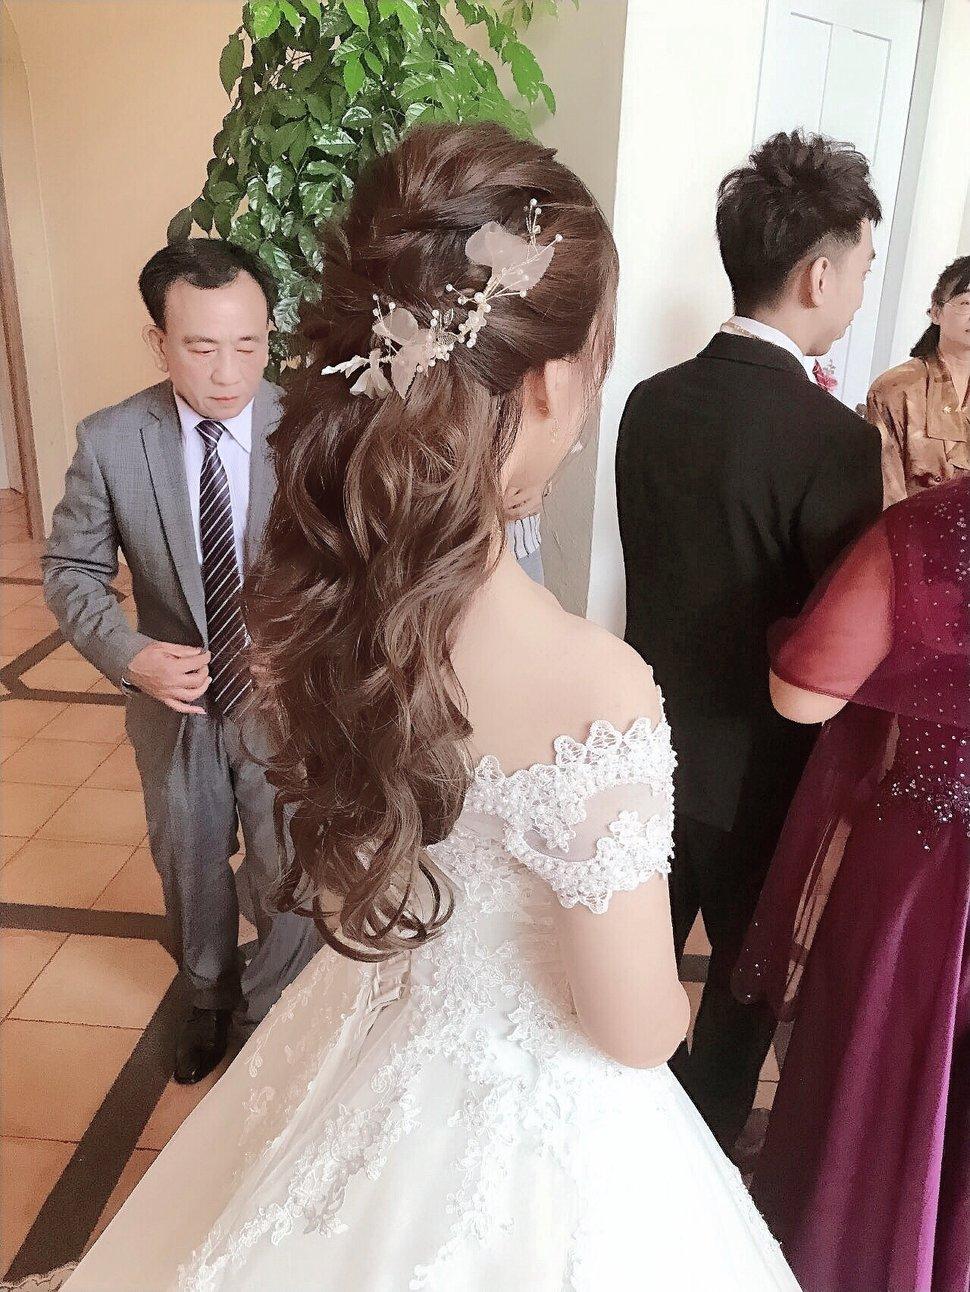 1AC3972C-785E-46D7-813C-A9E49CF1DC4E - 全台新祕 銘鴻 Hong stylist《結婚吧》